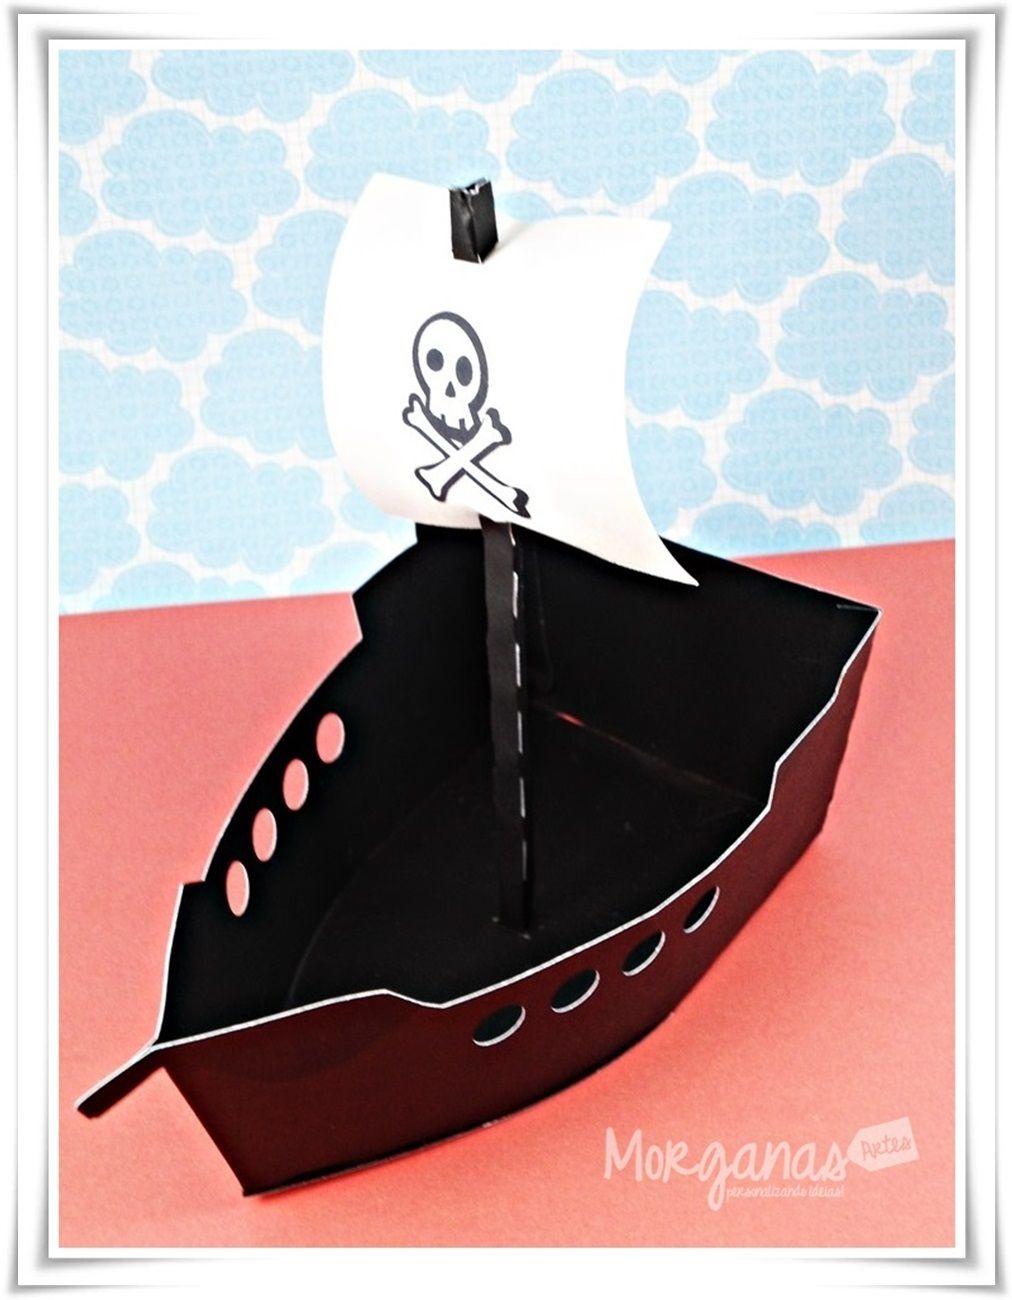 BaiduImage molde barco pirata jake_Pesquisa do Baidu | cumple 3 ...